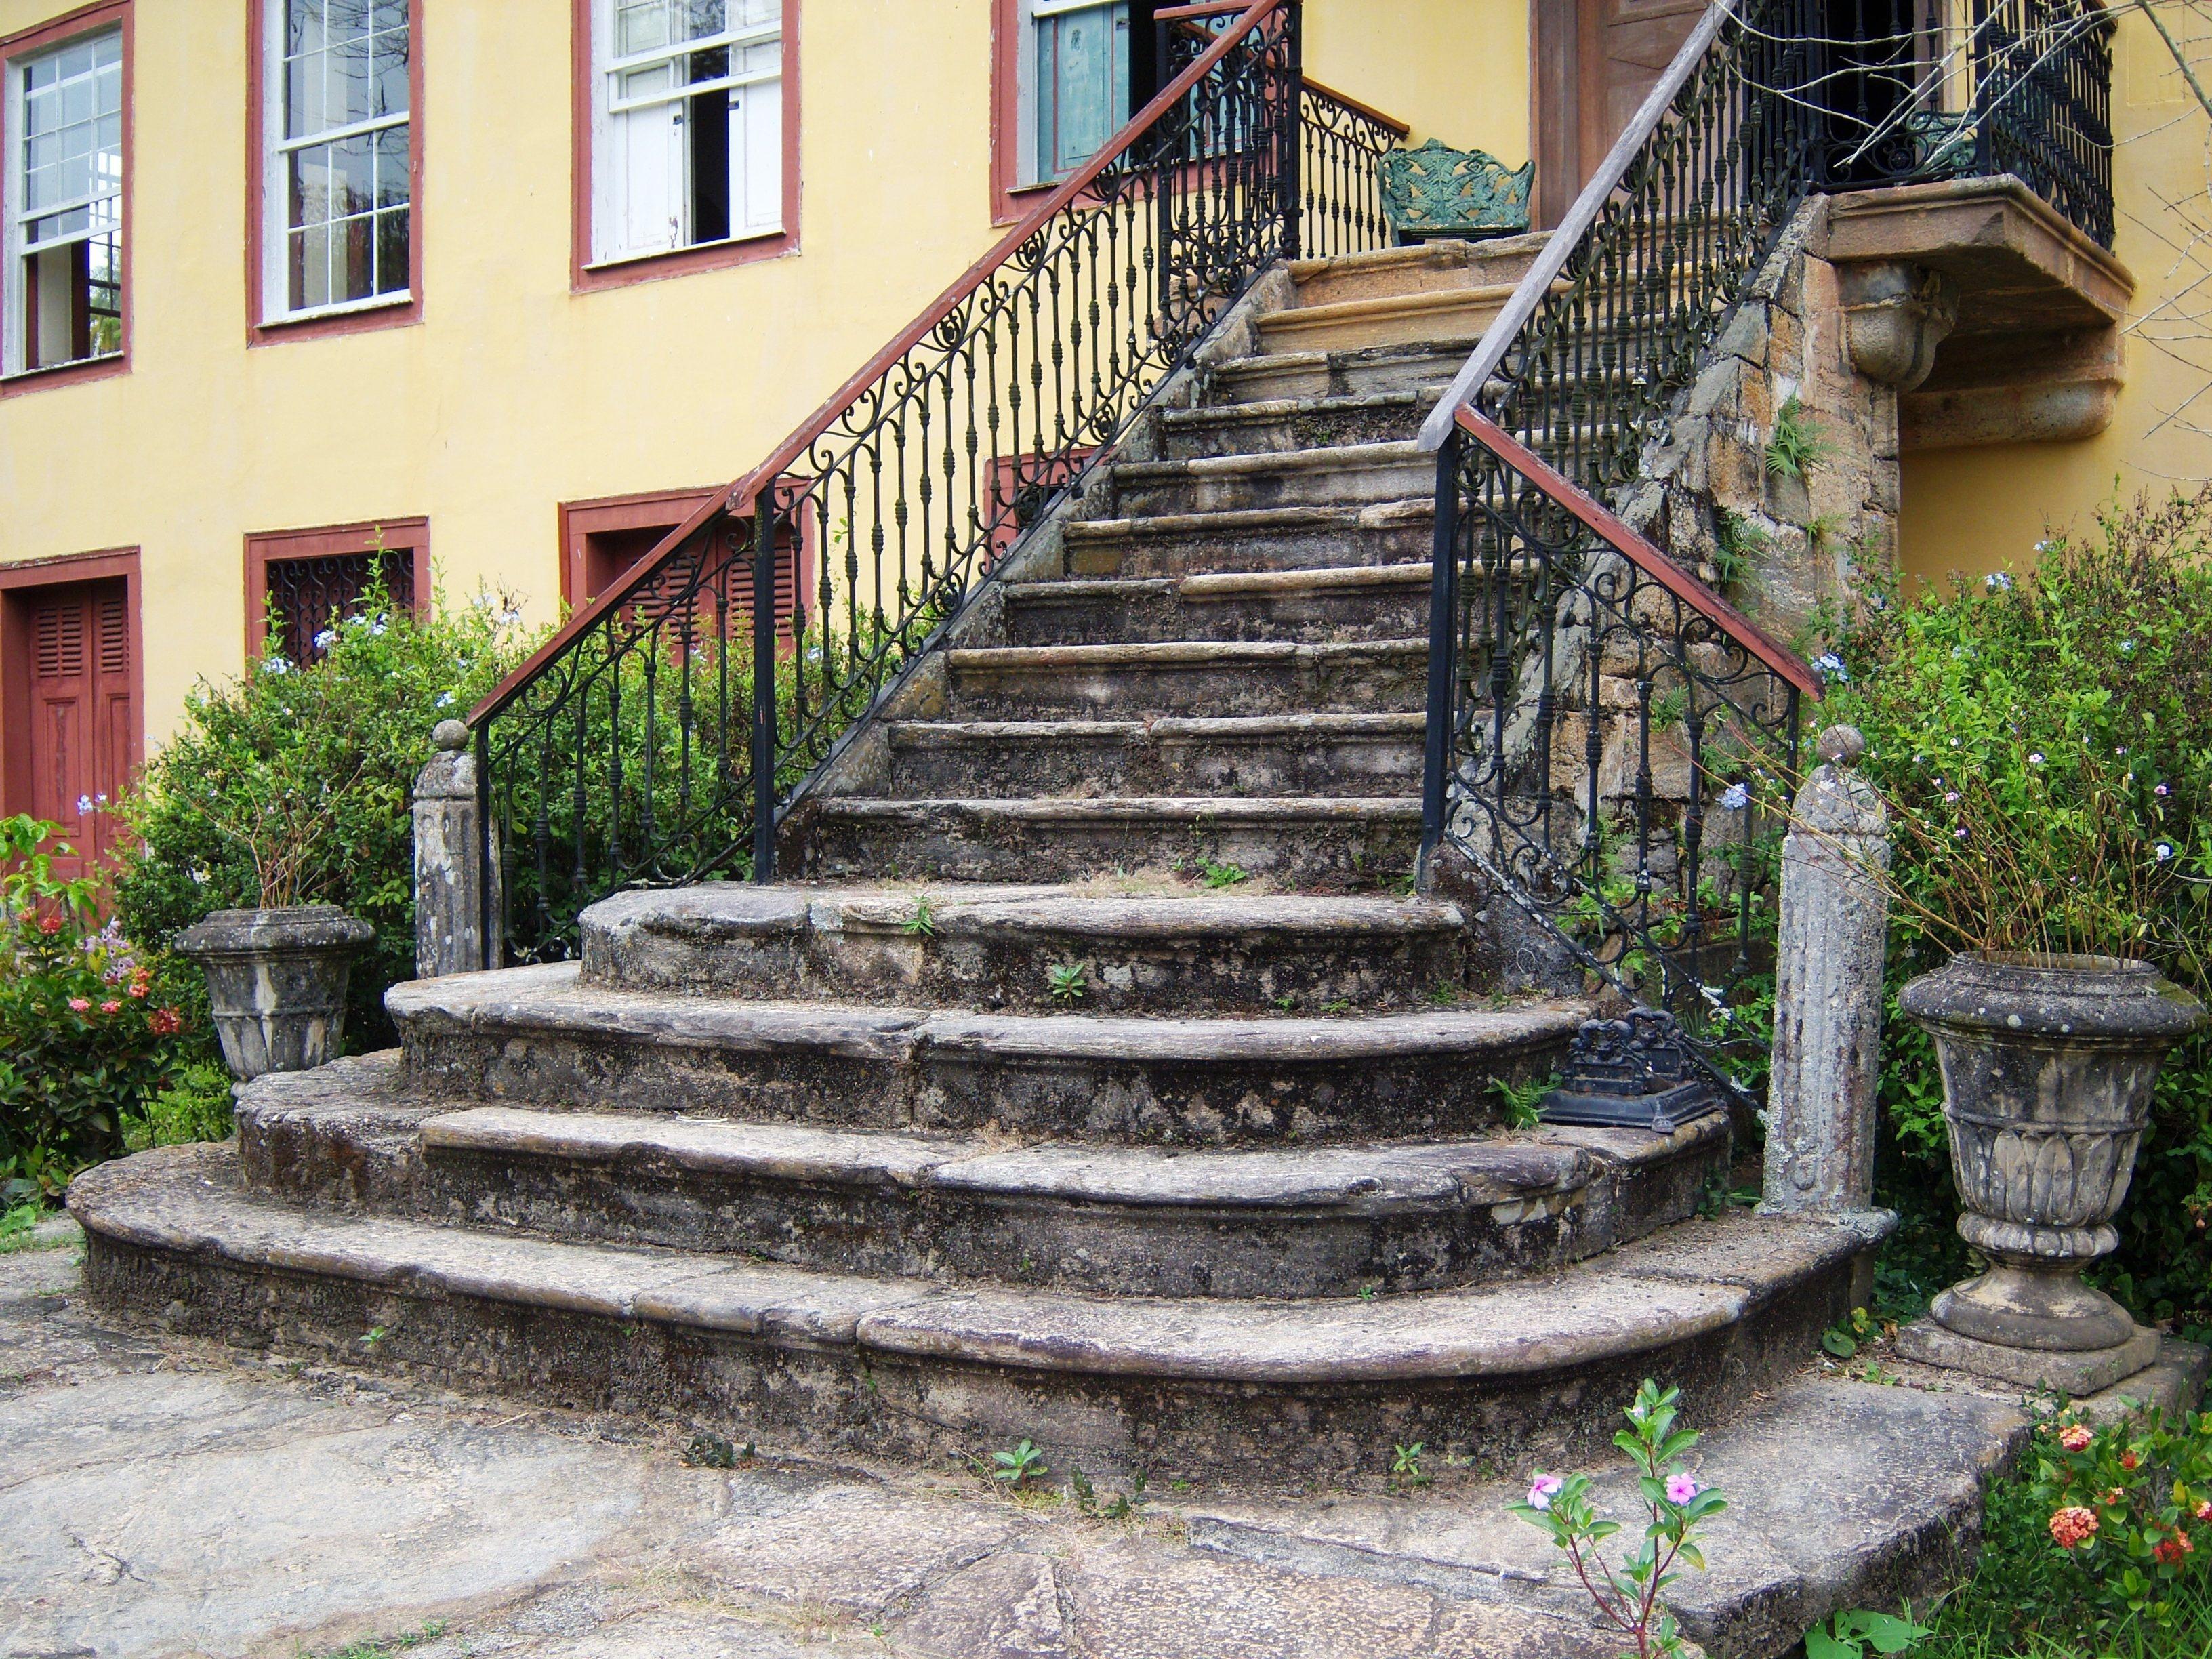 Escaleras jardin amazing escaleras jardin with escaleras jardin top de escaleras flotantes - Escaleras de jardin ...